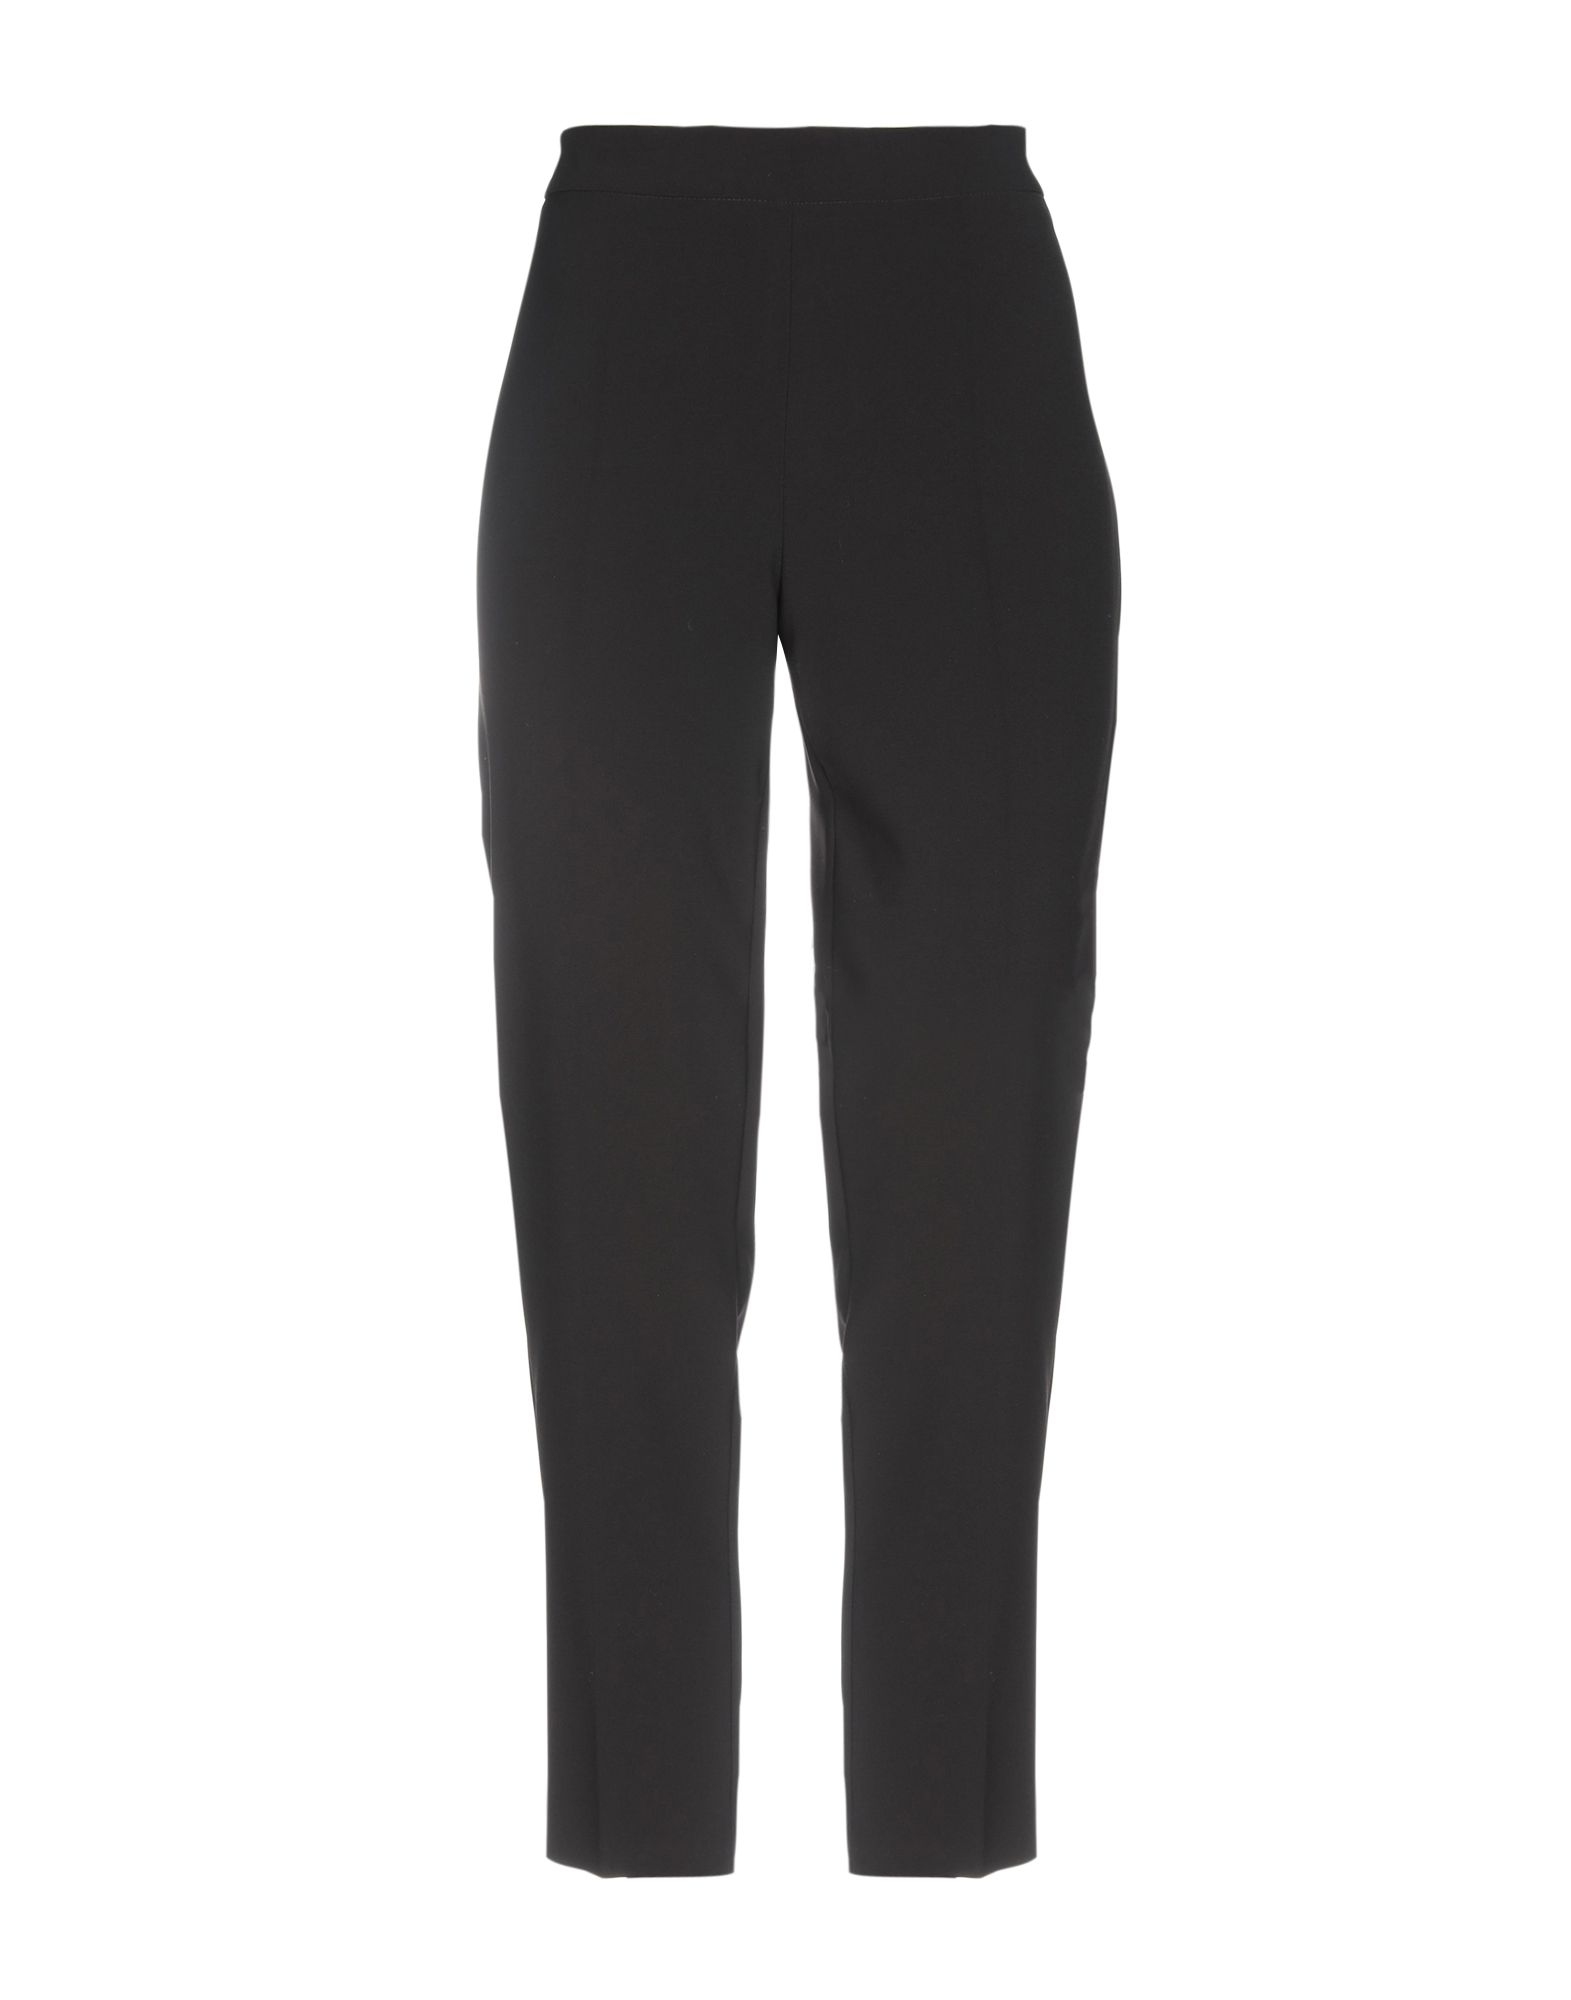 LA FEE MARABOUTEE Повседневные брюки agatha ruiz de la prada повседневные брюки